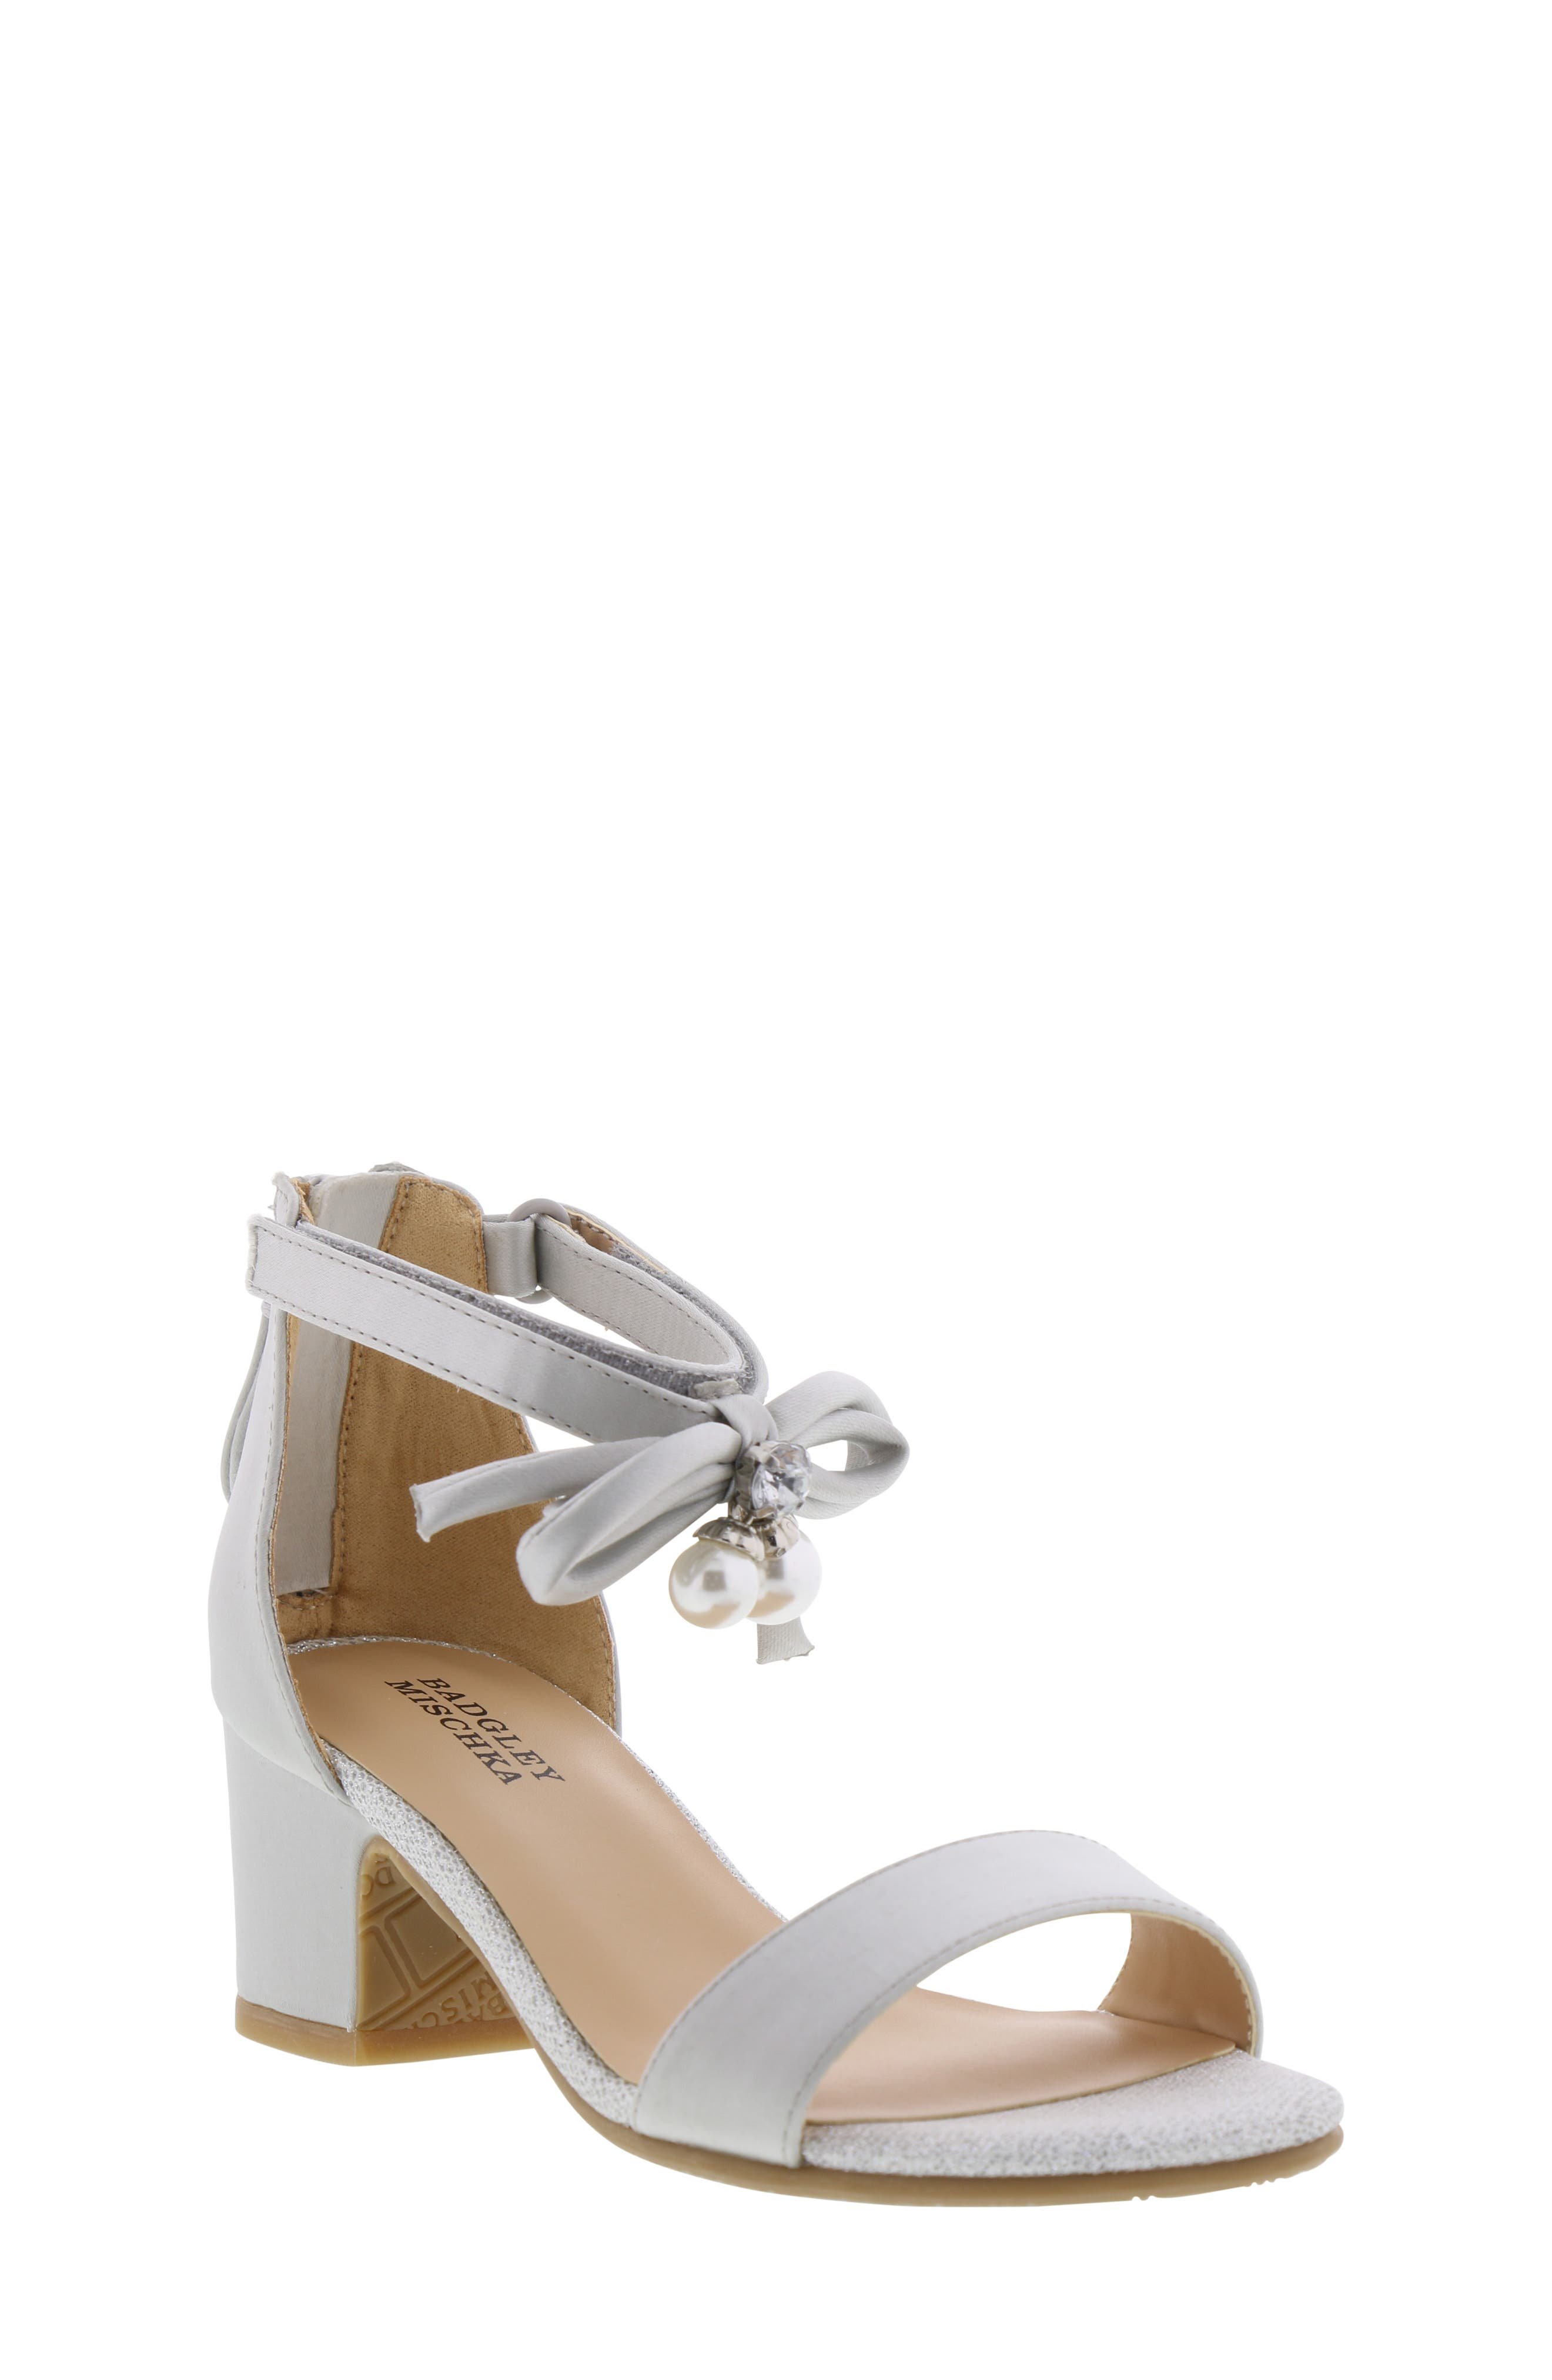 BADGLEY MISCHKA COLLECTION Badgley Mischka Pernia Embellished Bow Sandal, Main, color, SILVER